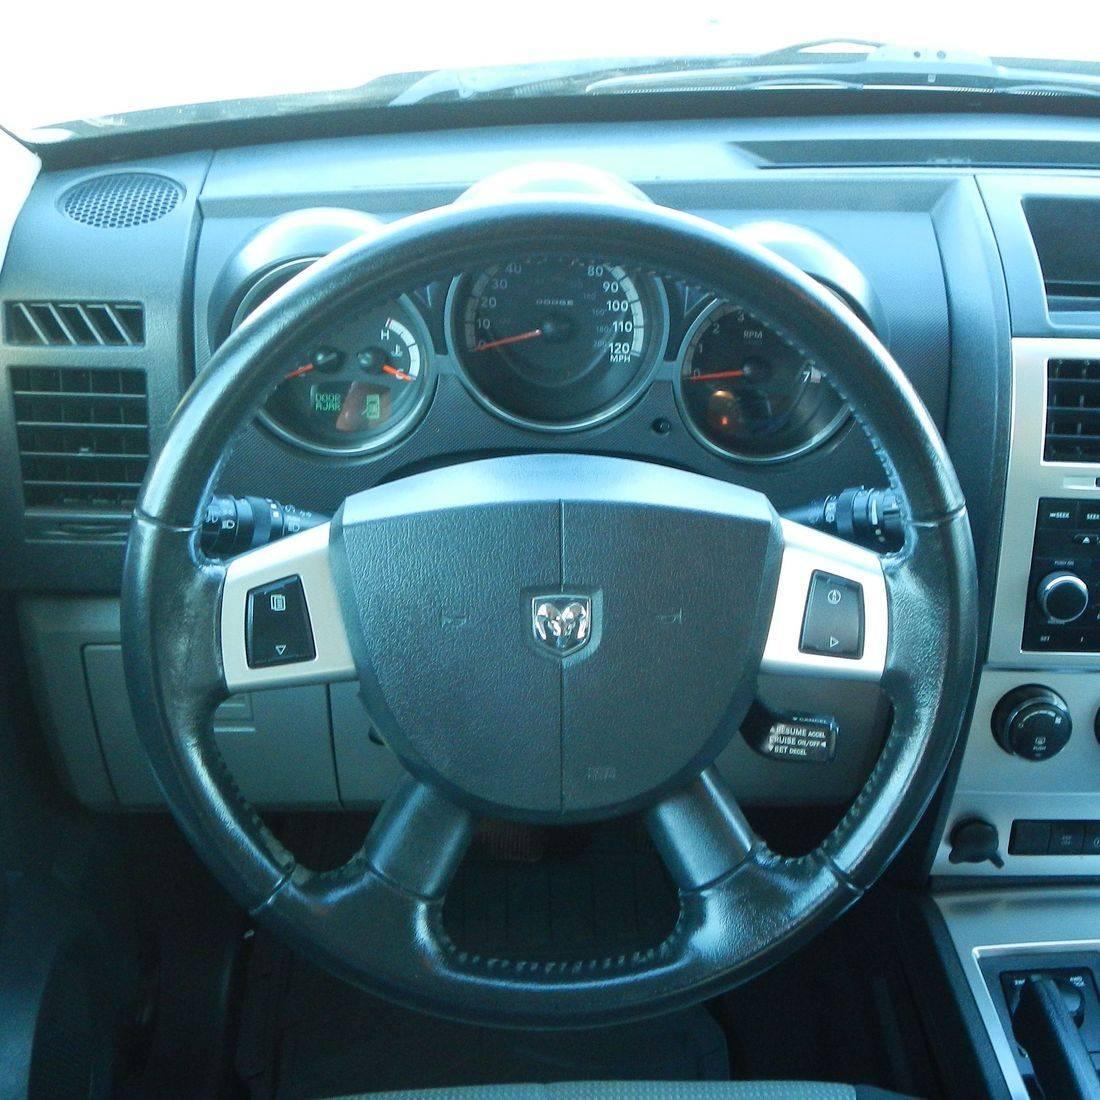 2007 Dodge Nitro SLT 4x4